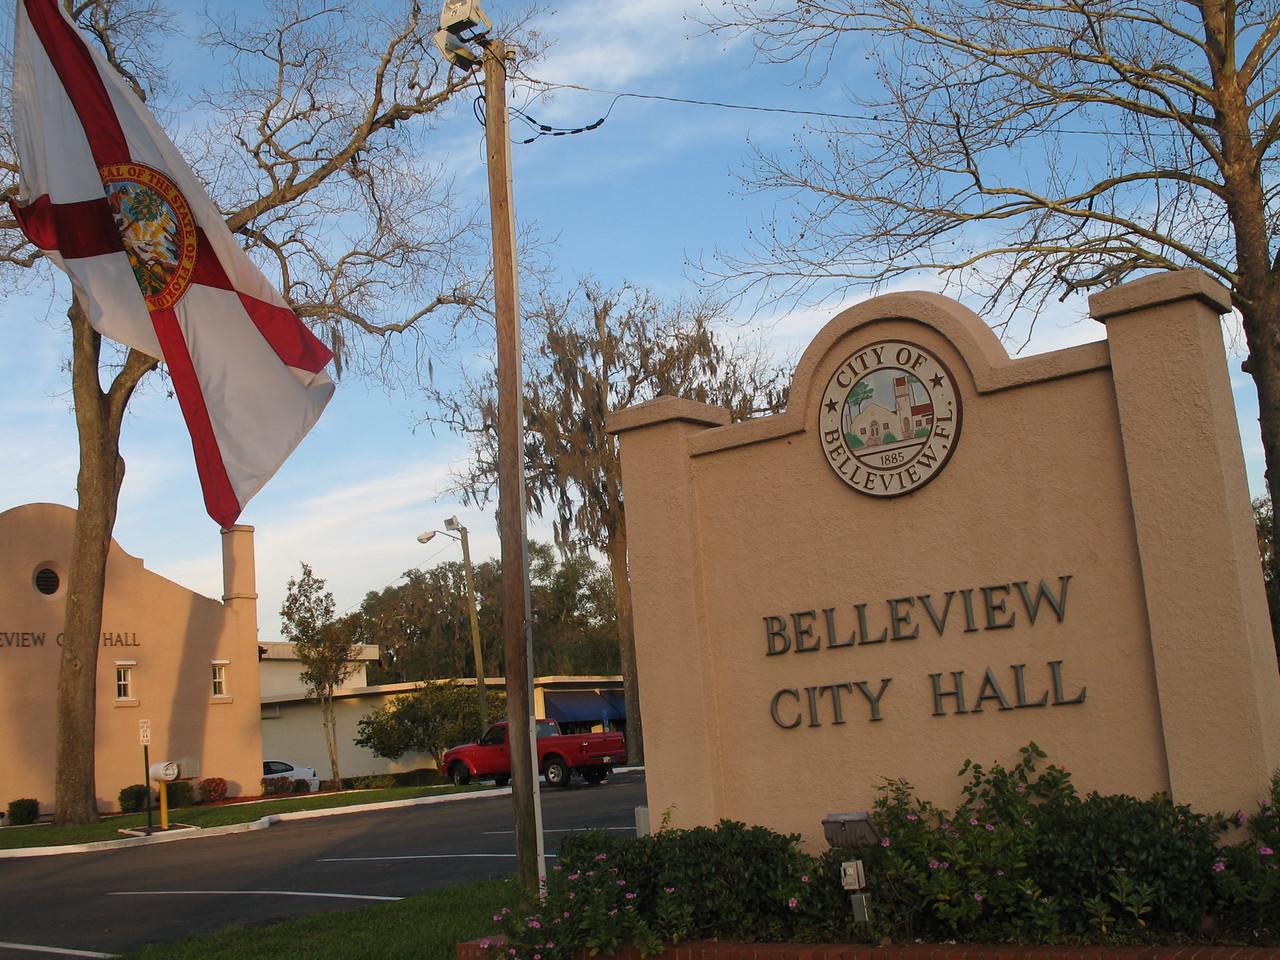 Belleview City Hall<br /> PHOTO CREDIT: Florida Trail Association / Sandra Friend